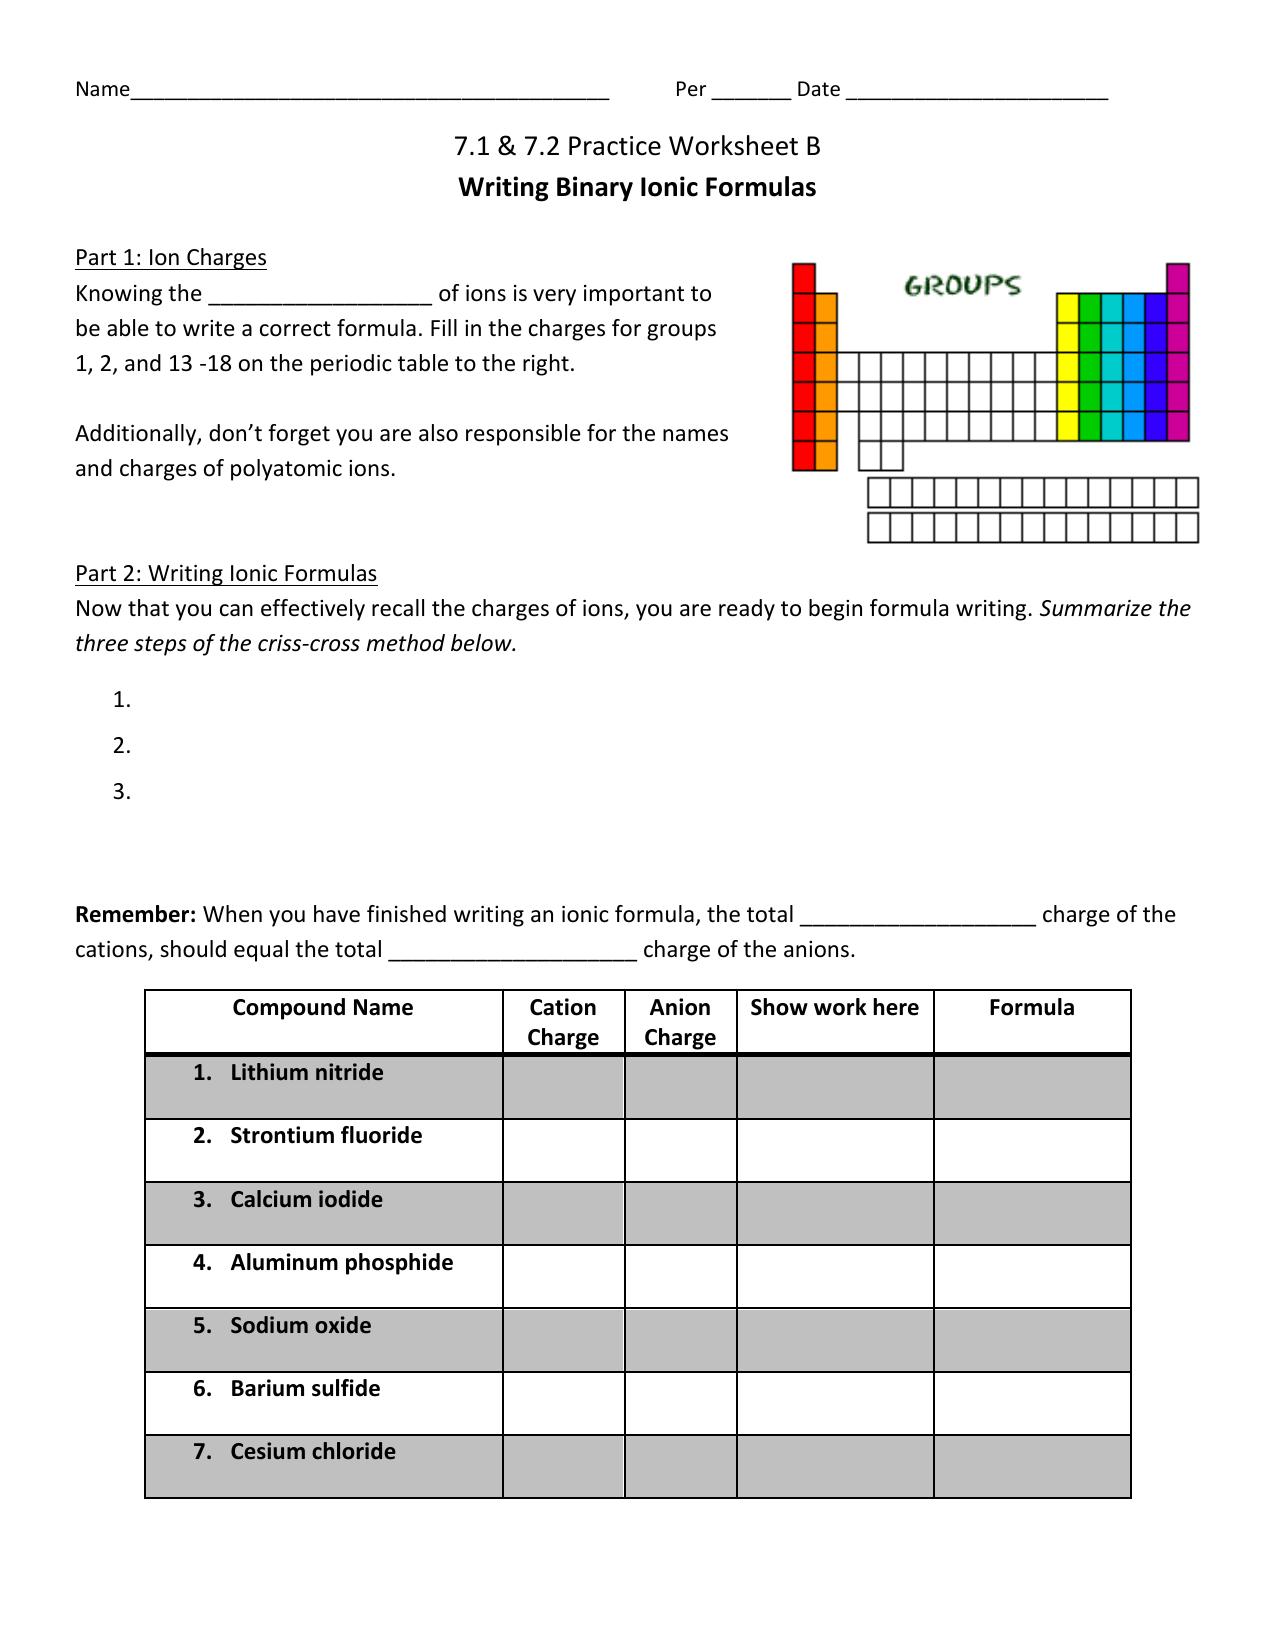 Worksheets Writing Ionic Formulas Worksheet writing binary ionic formulas